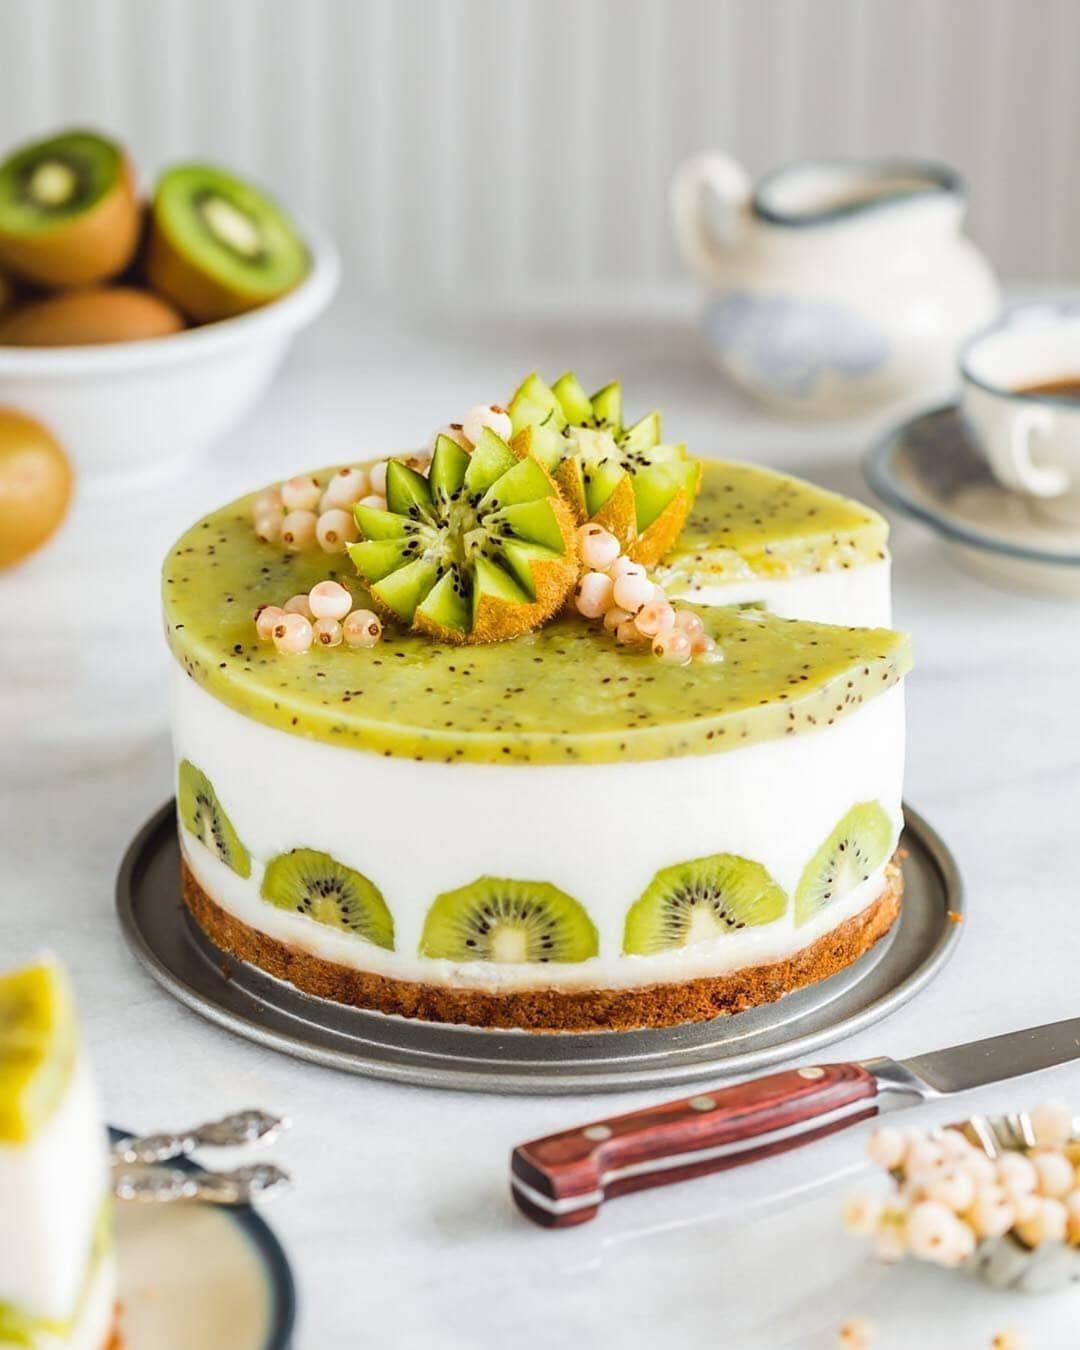 This Is Kiwi Yogurt Cake Vegan Friendly Gluten Refined Sugar